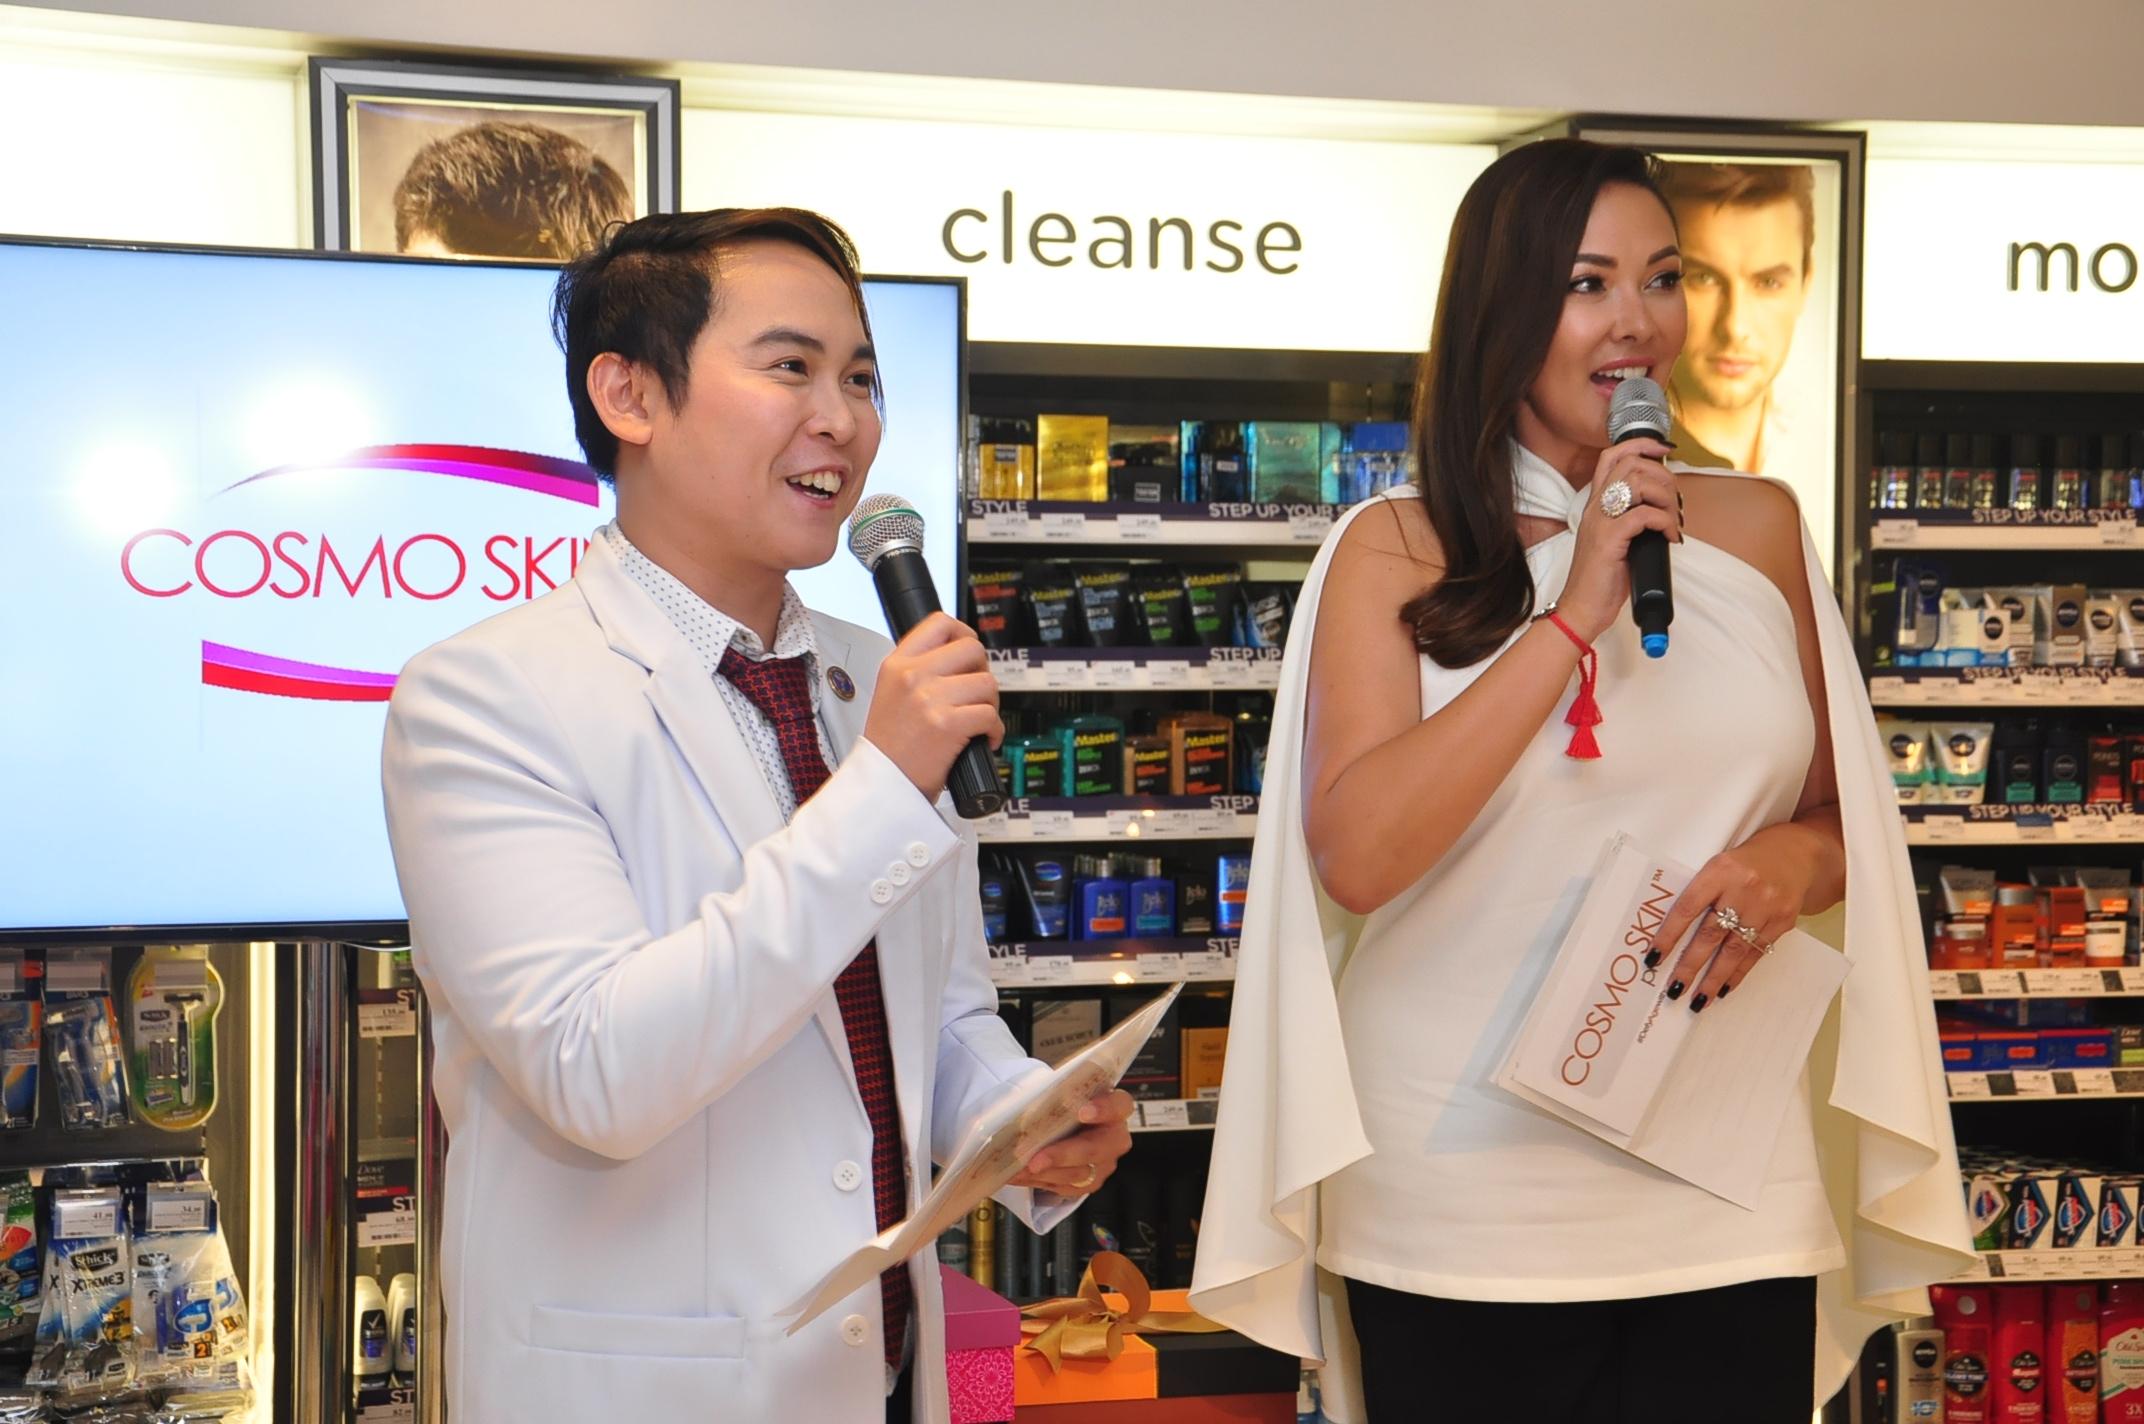 Cosmo Skin founder and marketing director Dr. Nino Bautista and brand endorser Ruffa Gutierrez